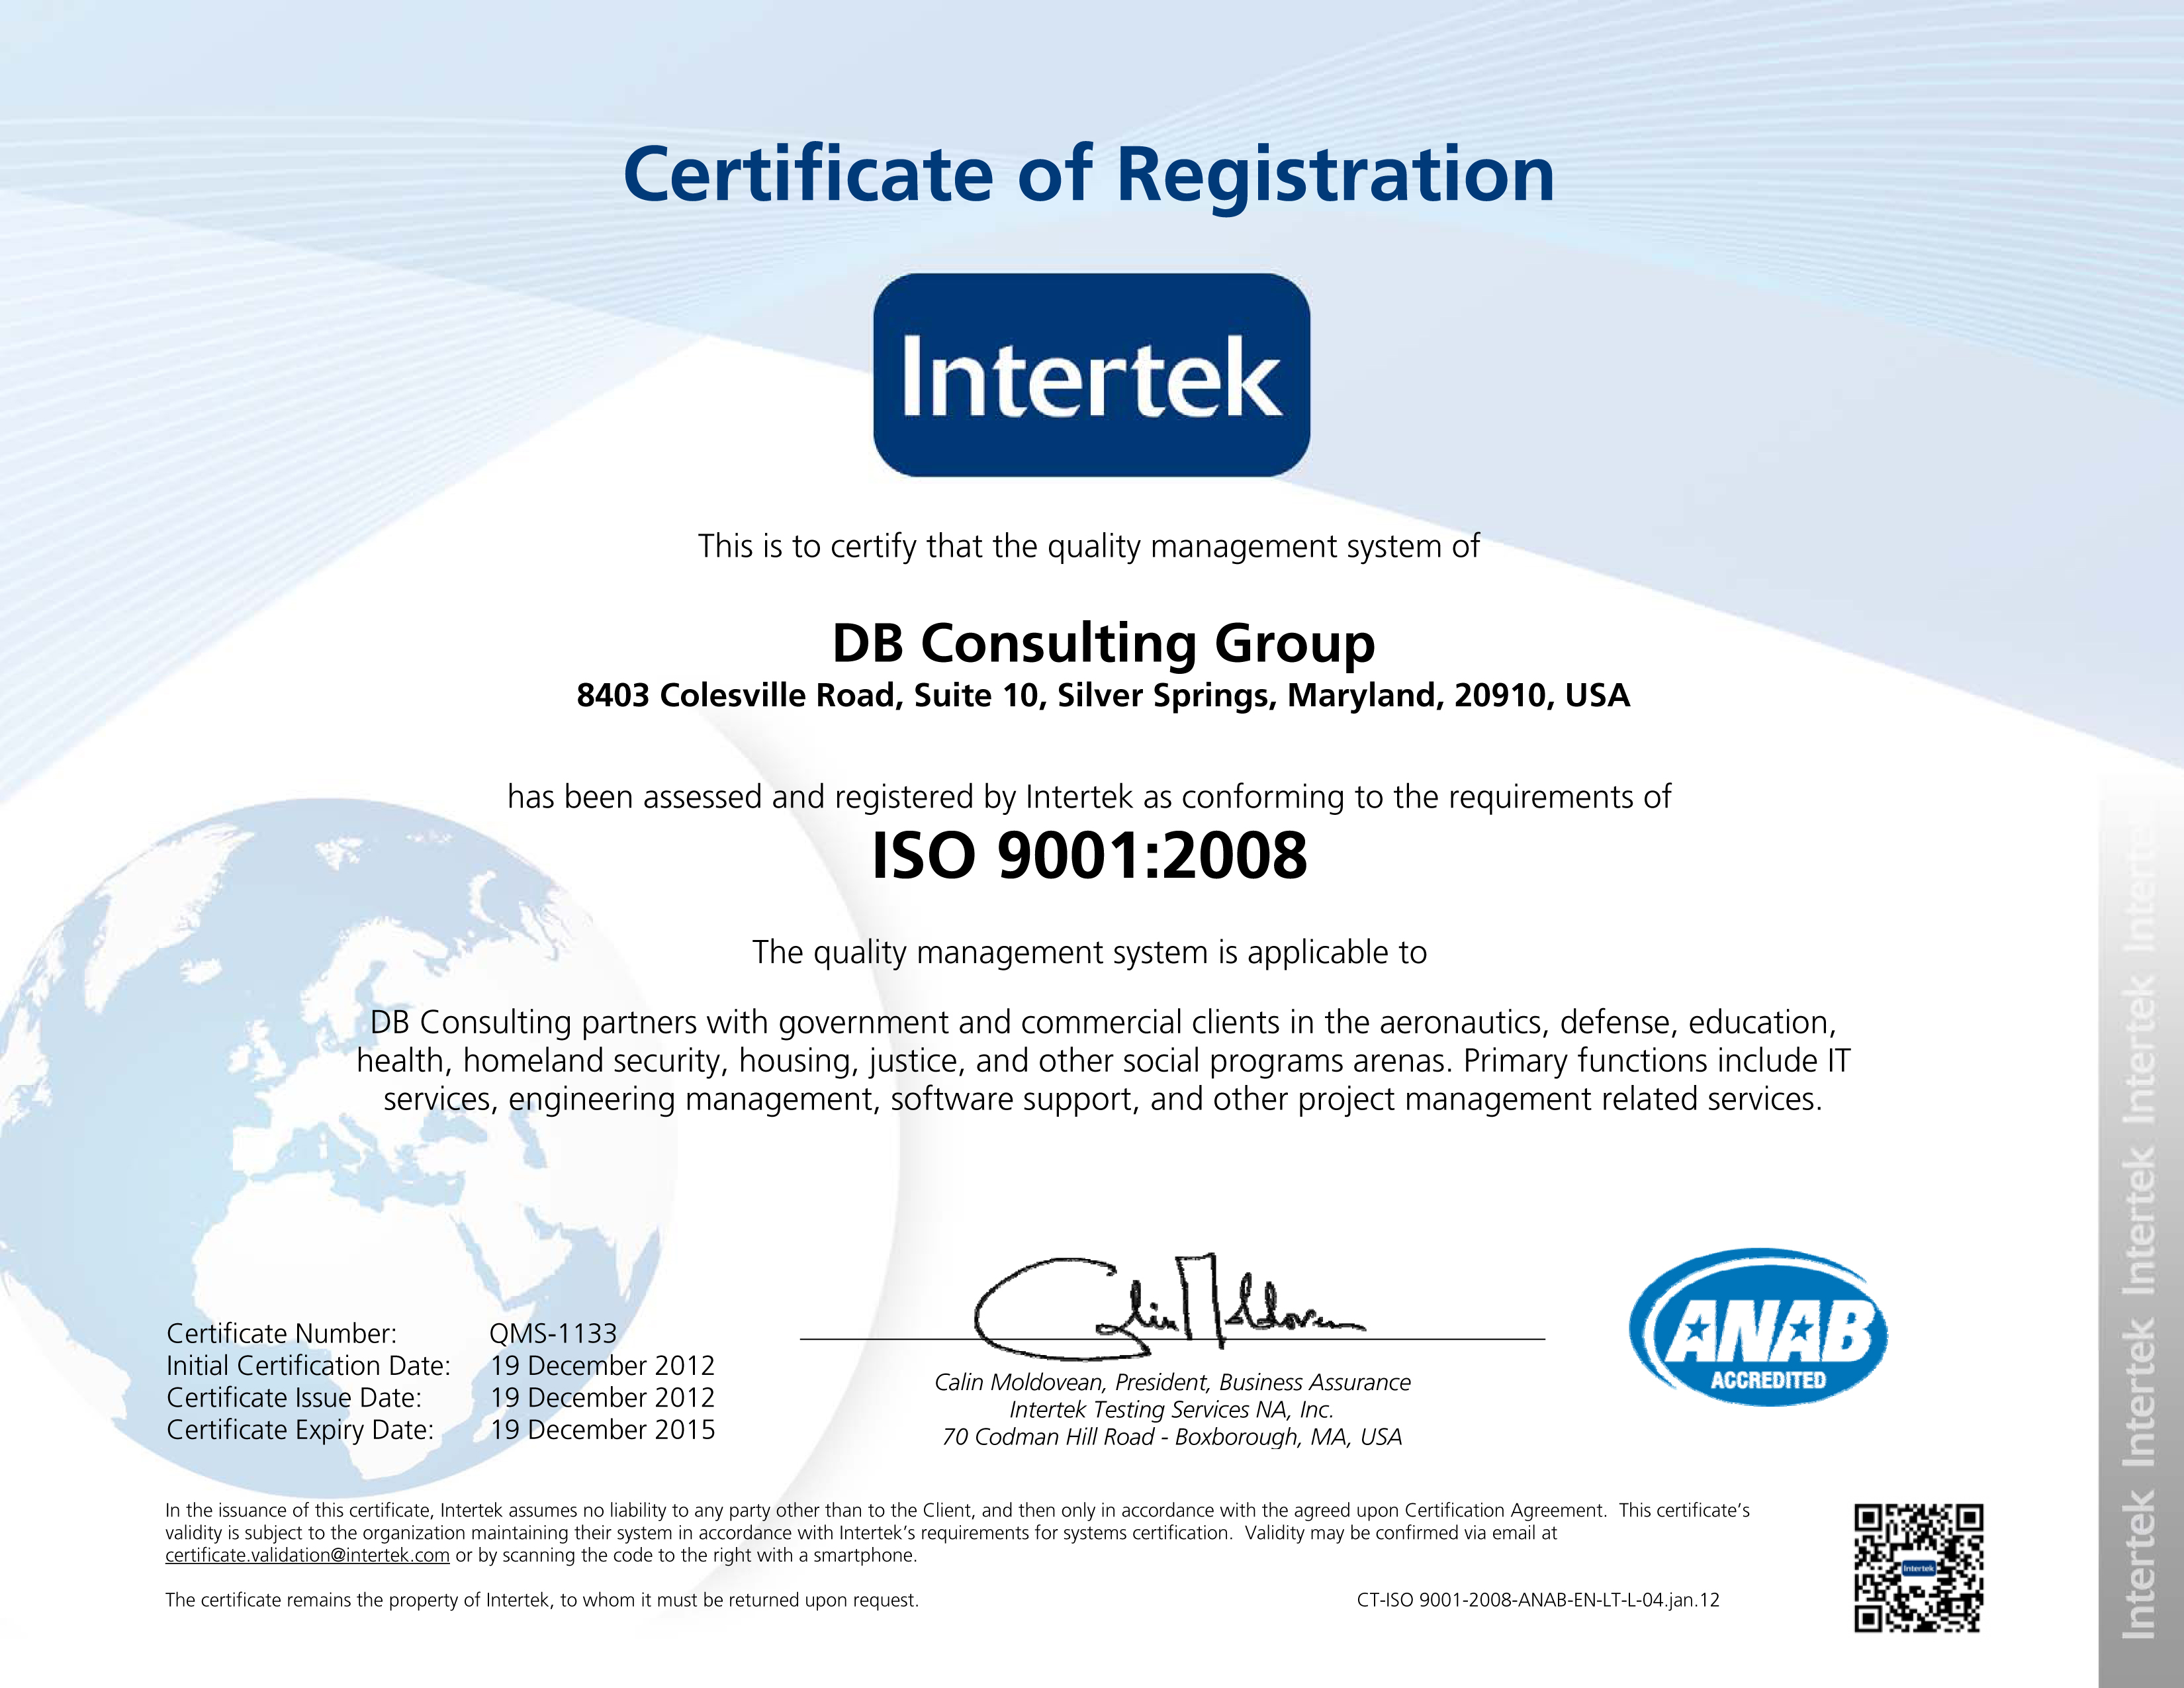 nasa employee certificate - photo #1